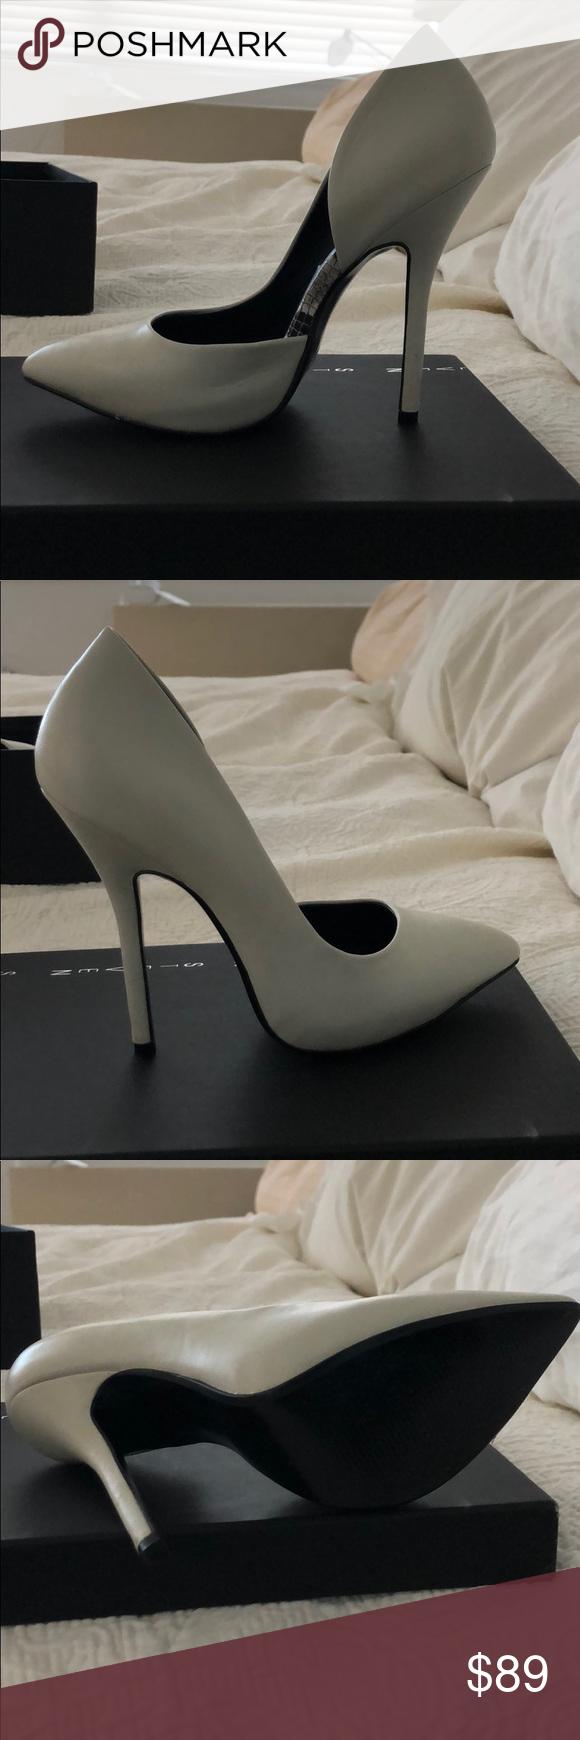 70465d130e2 Brand new high heel shoes Brand new sexy heels from Steve Madden ...